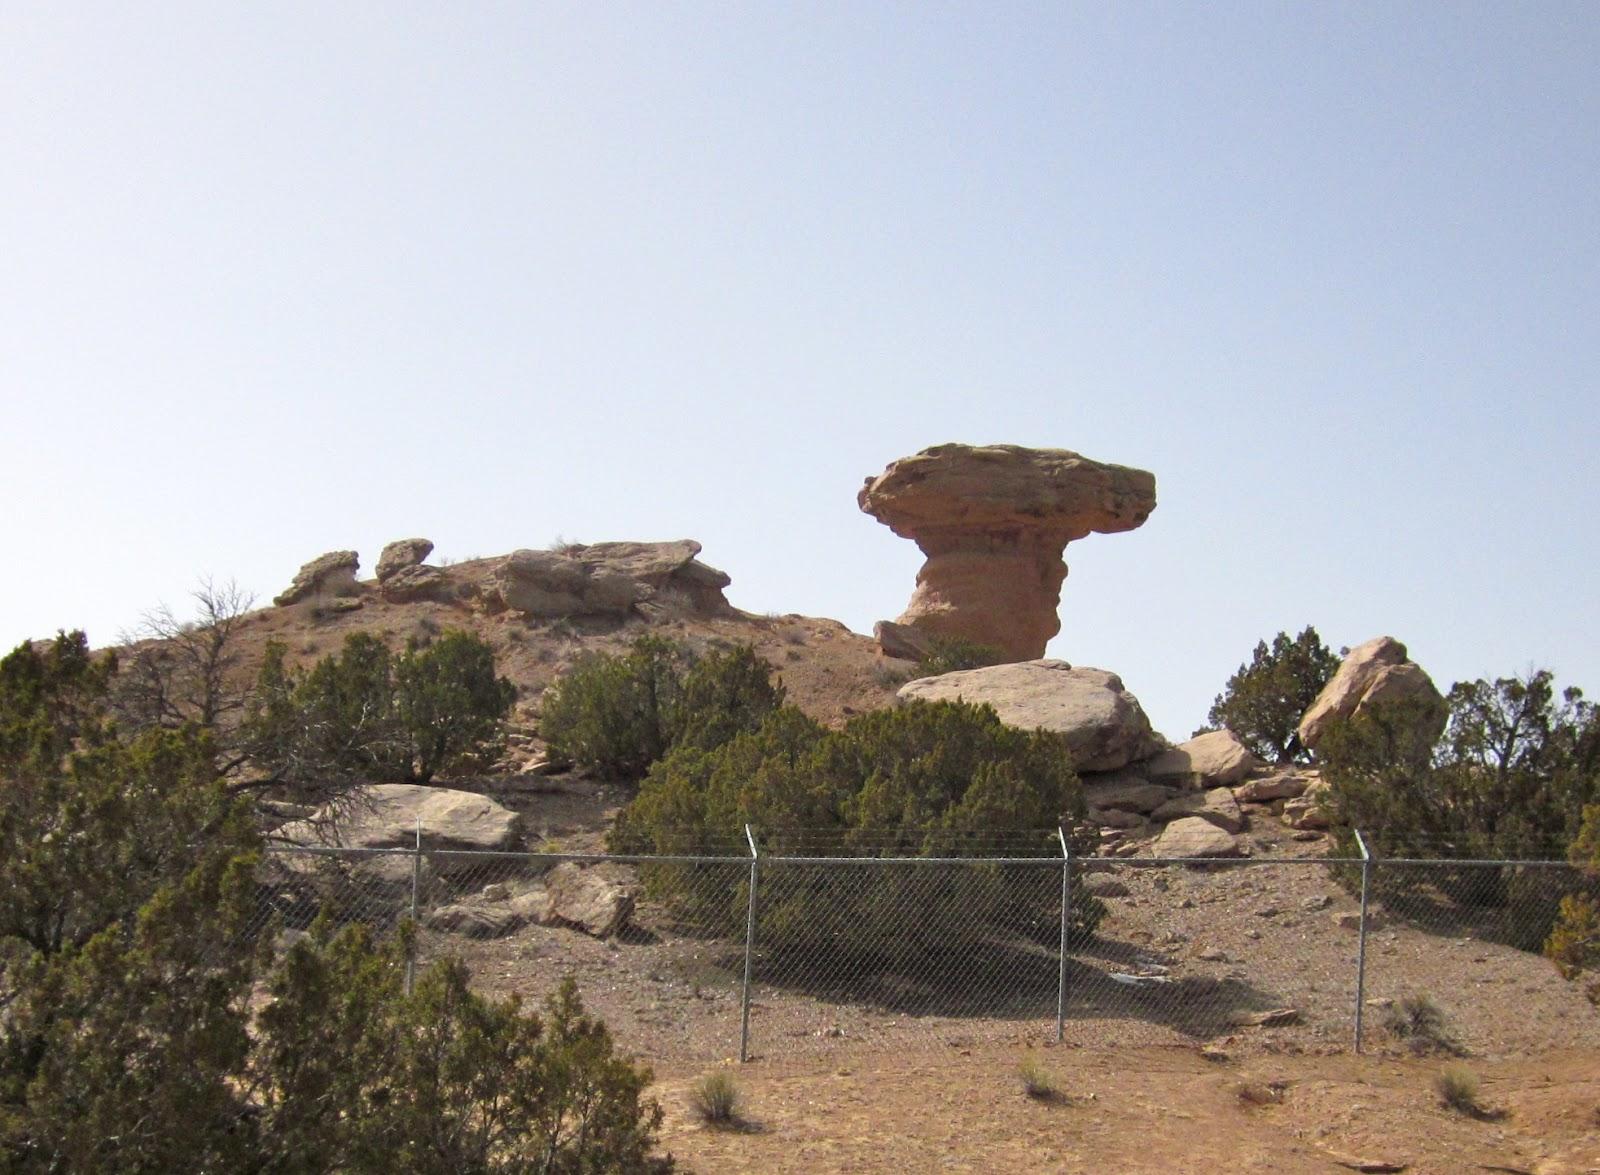 Our Epic Art O Mat 174 Road Trip Blog Around Santa Fe 2